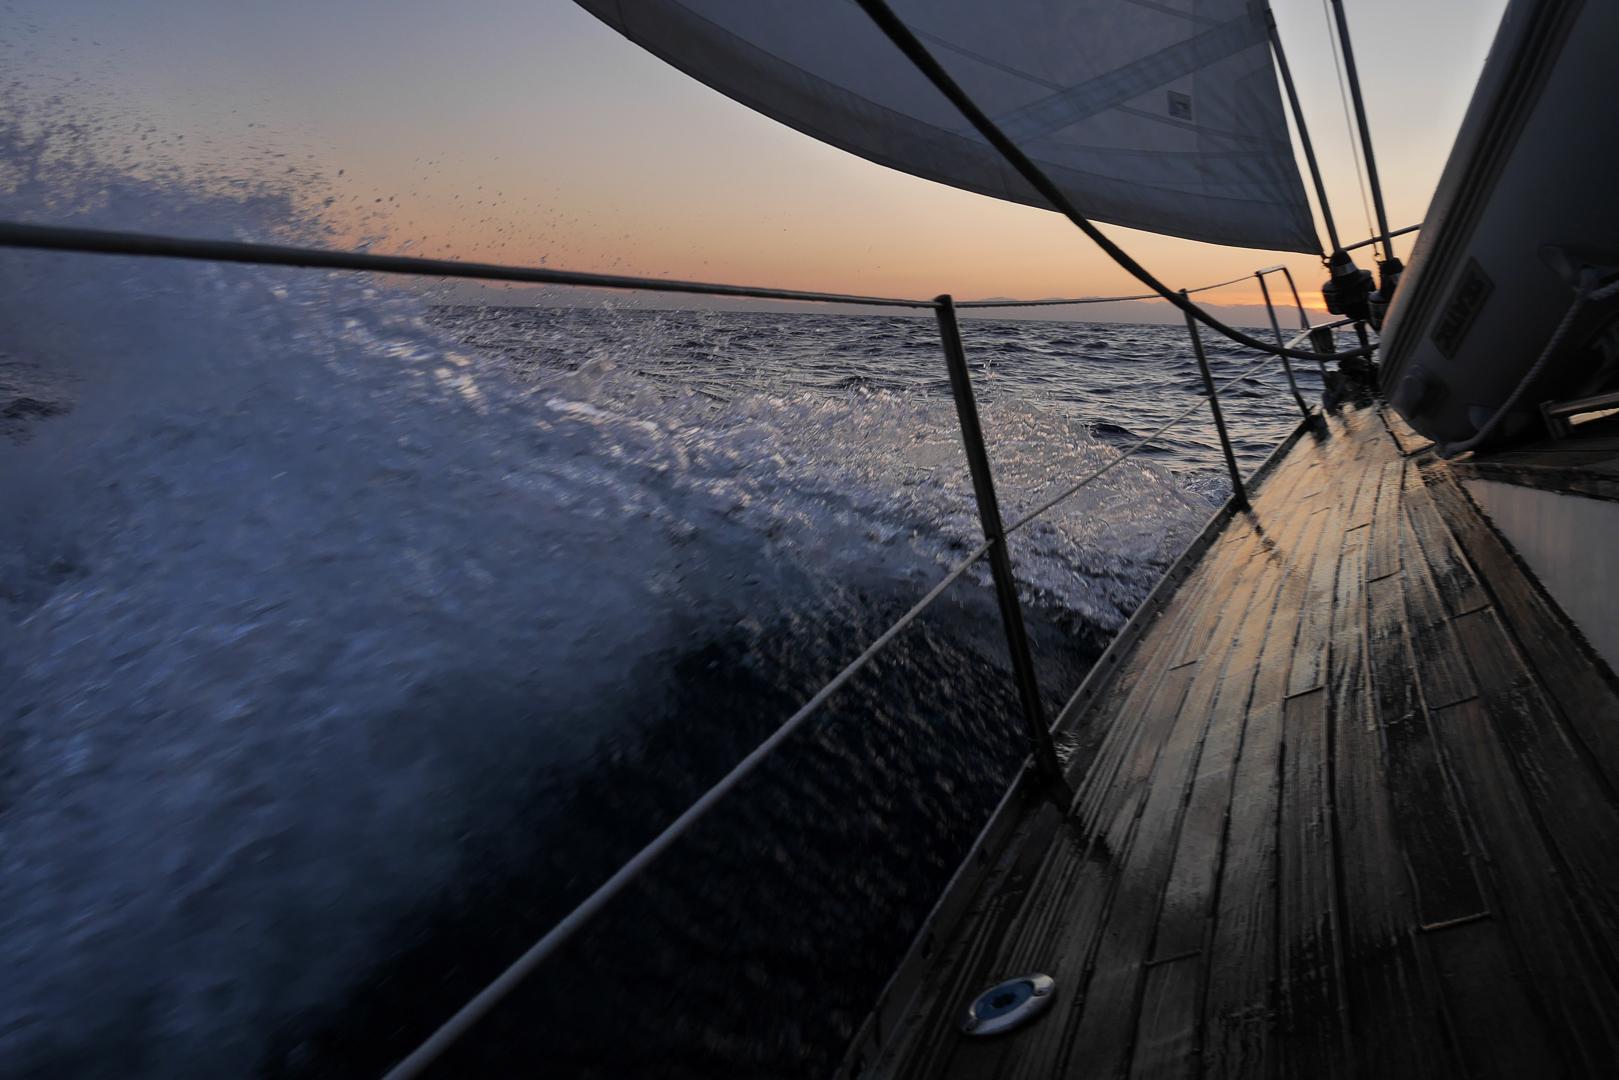 ITALY, Tyrrhenian Sea – Sailing. © Marko Kecman